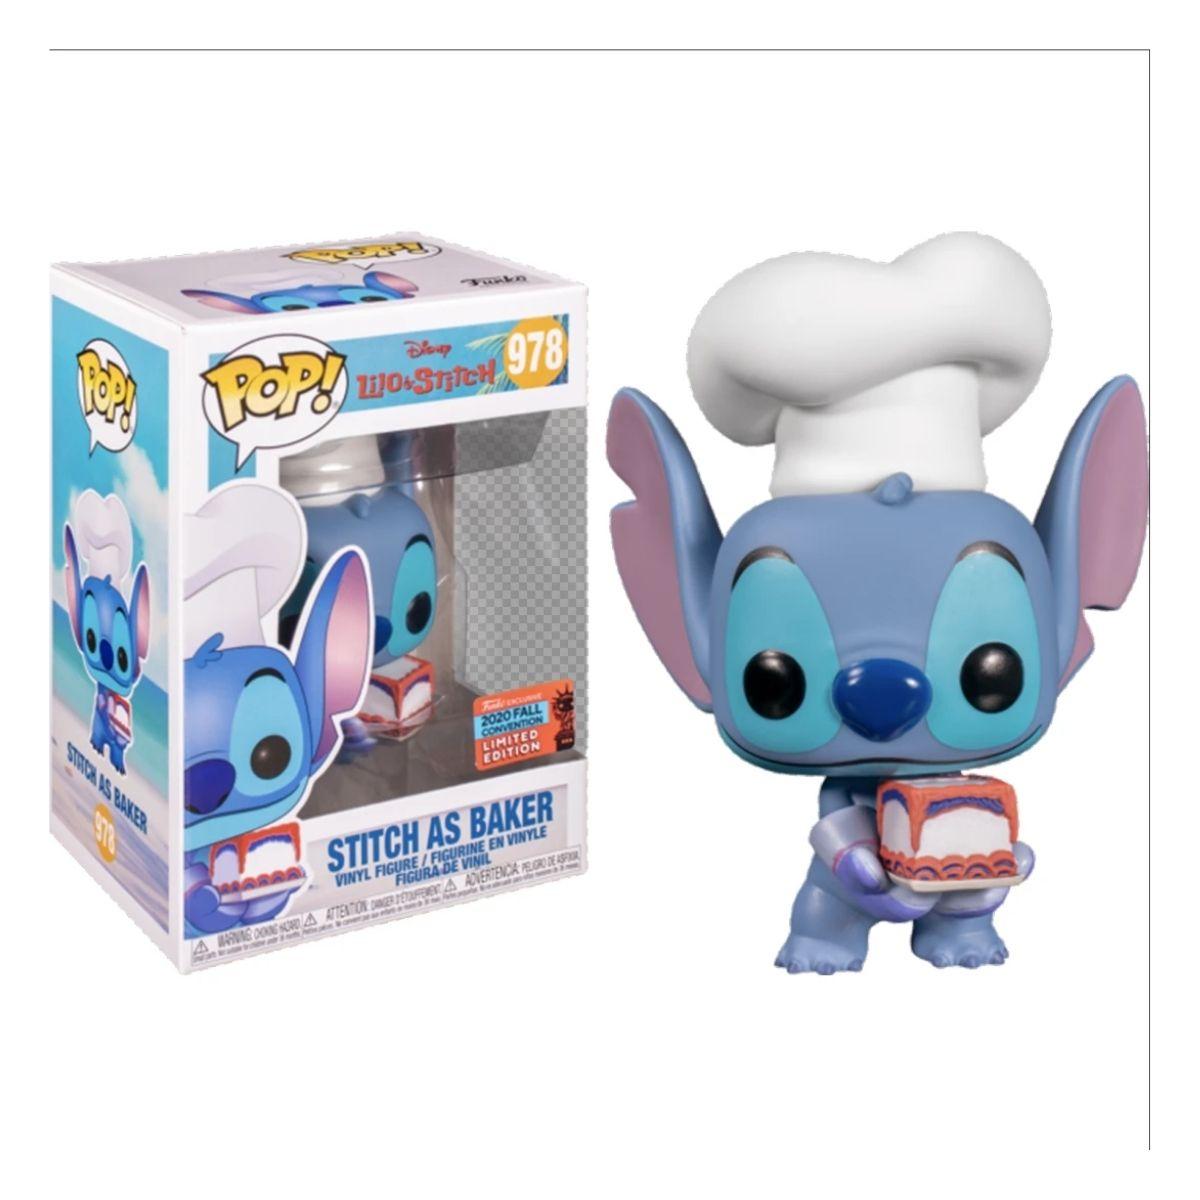 Funko Pop Disney Stitch As Baker Lilo & Stitch #978 Sdcc  - Game Land Brinquedos